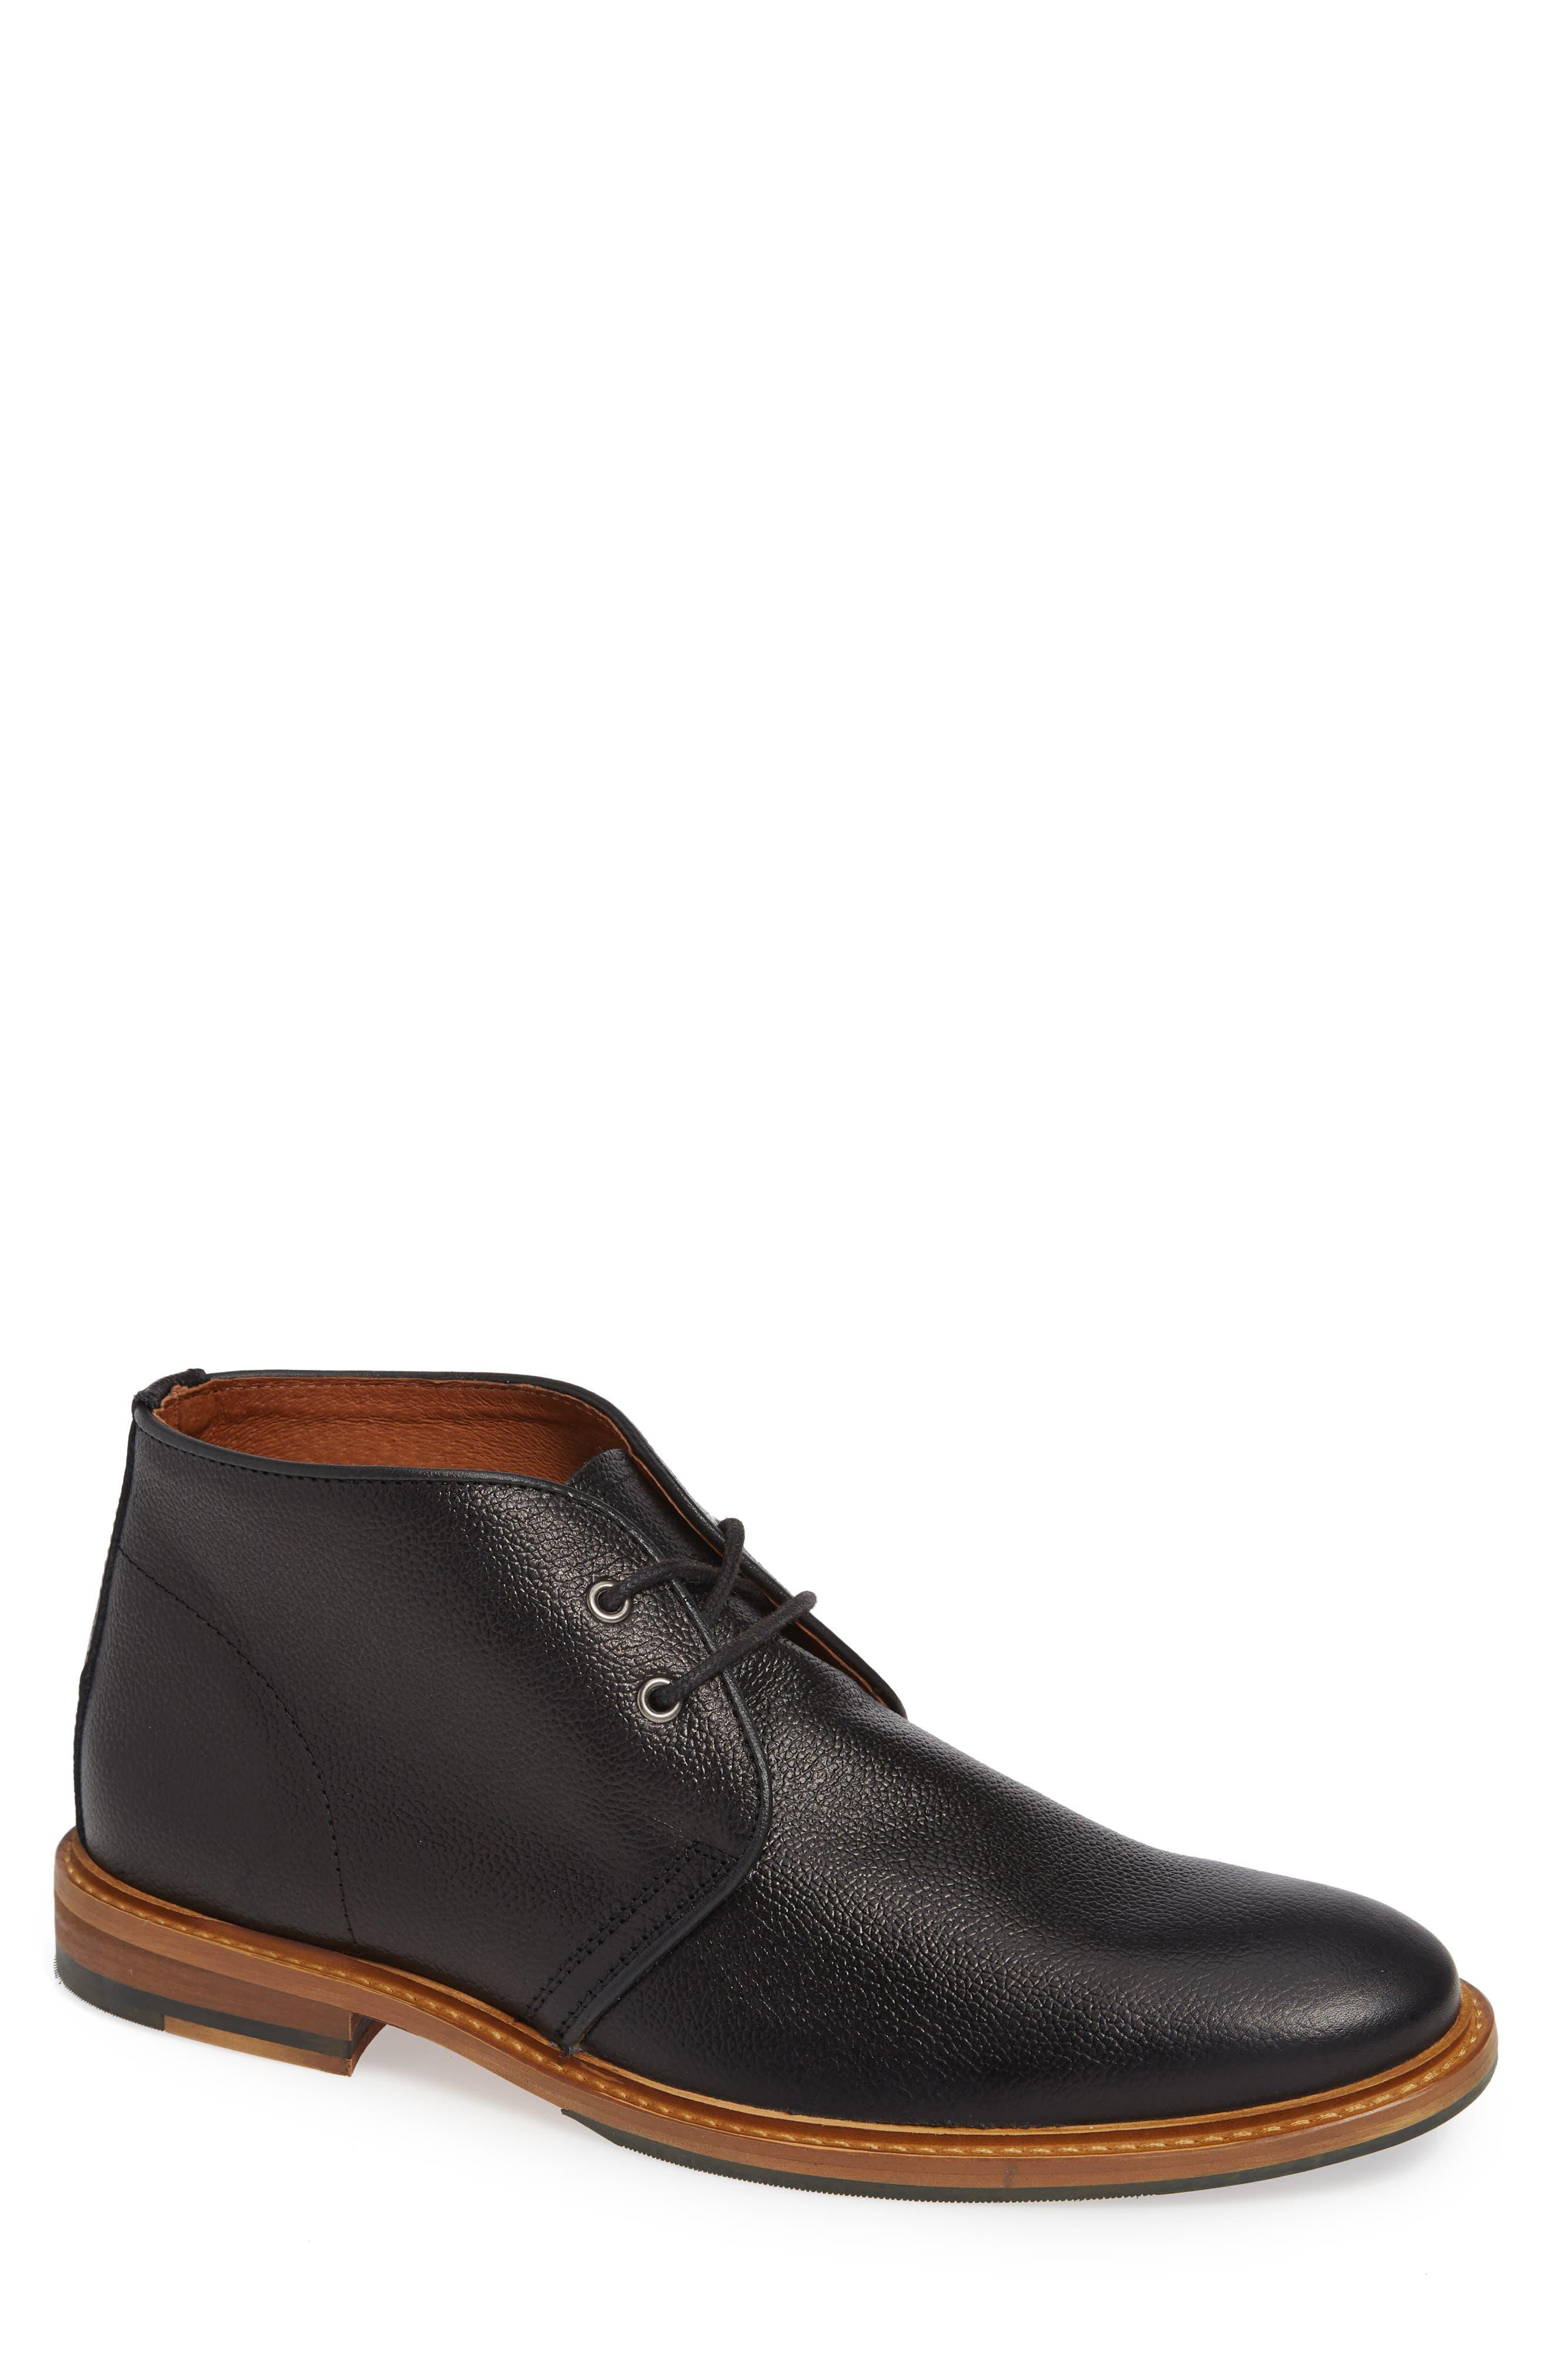 Eli Chukka Boot,                         Main,                         color, BLACK